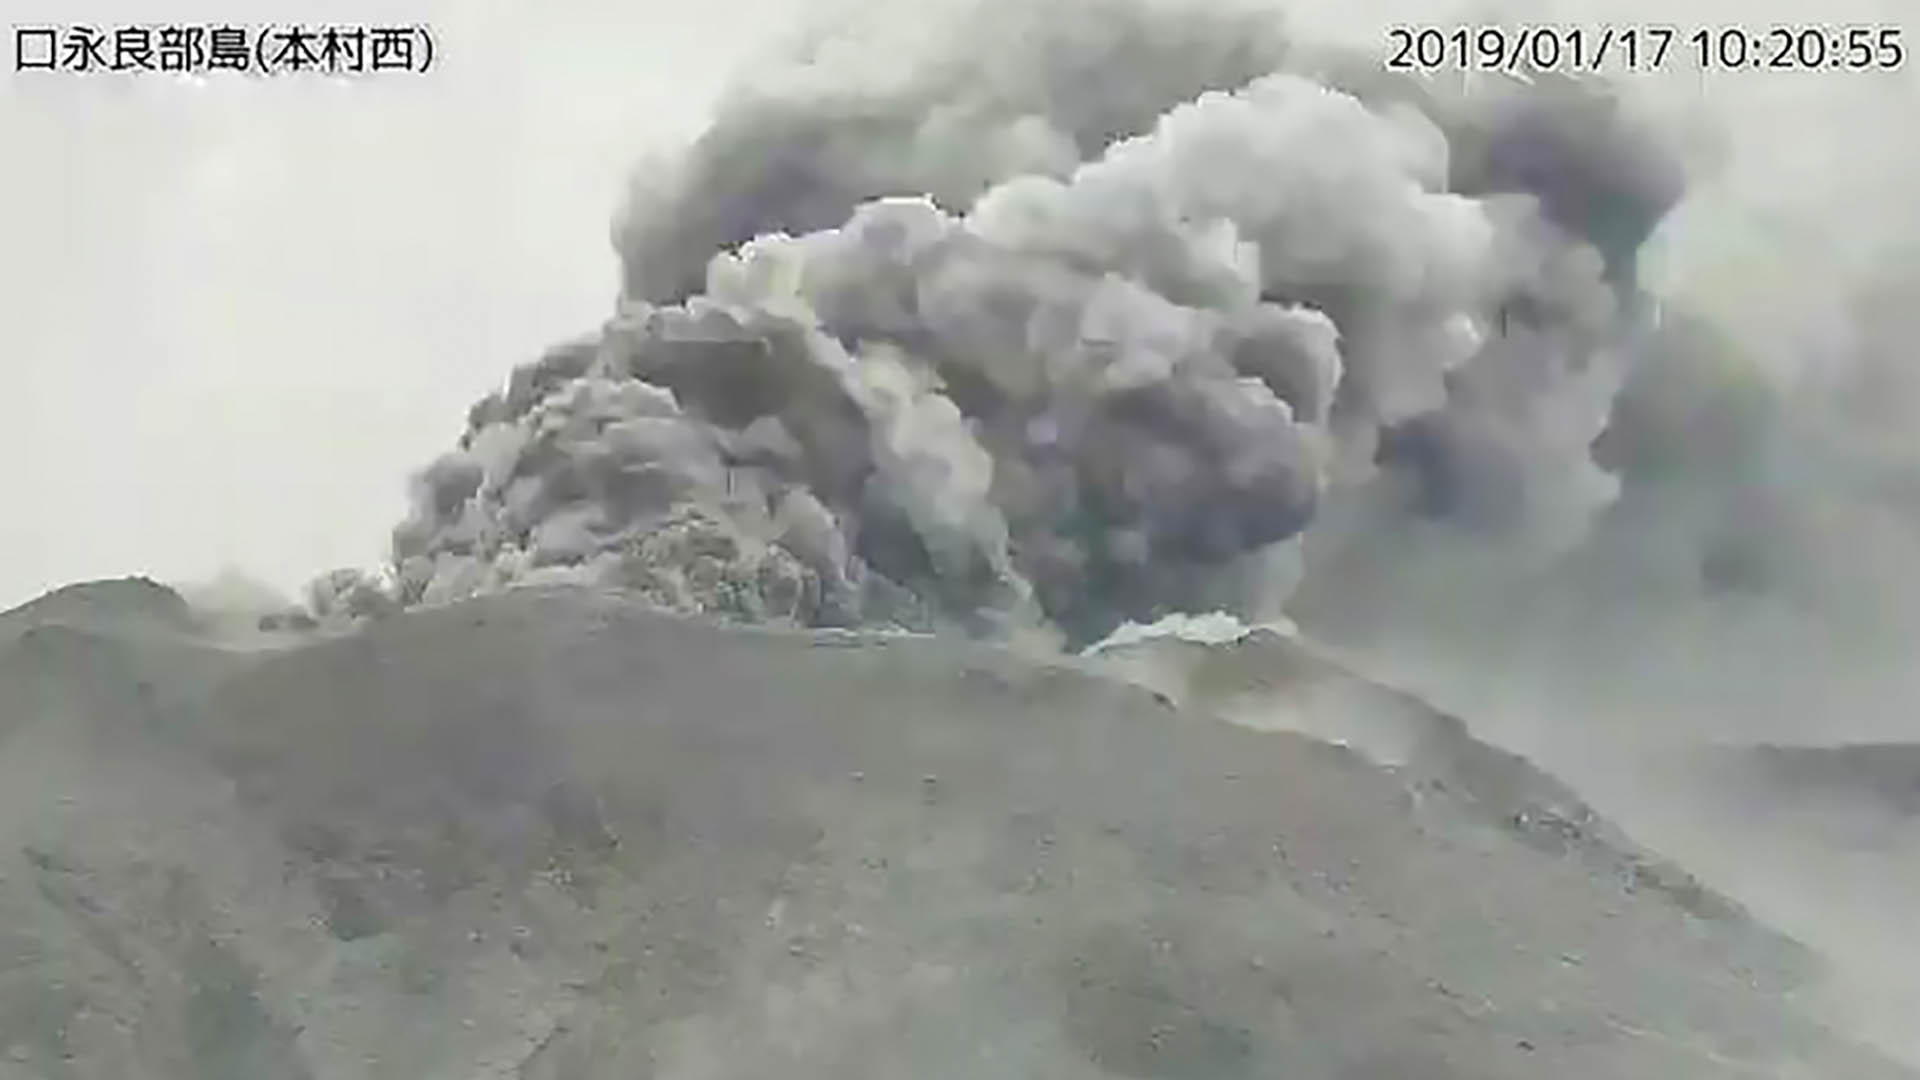 Erupción volcánica en isla japonesa de Kuchinoerabu